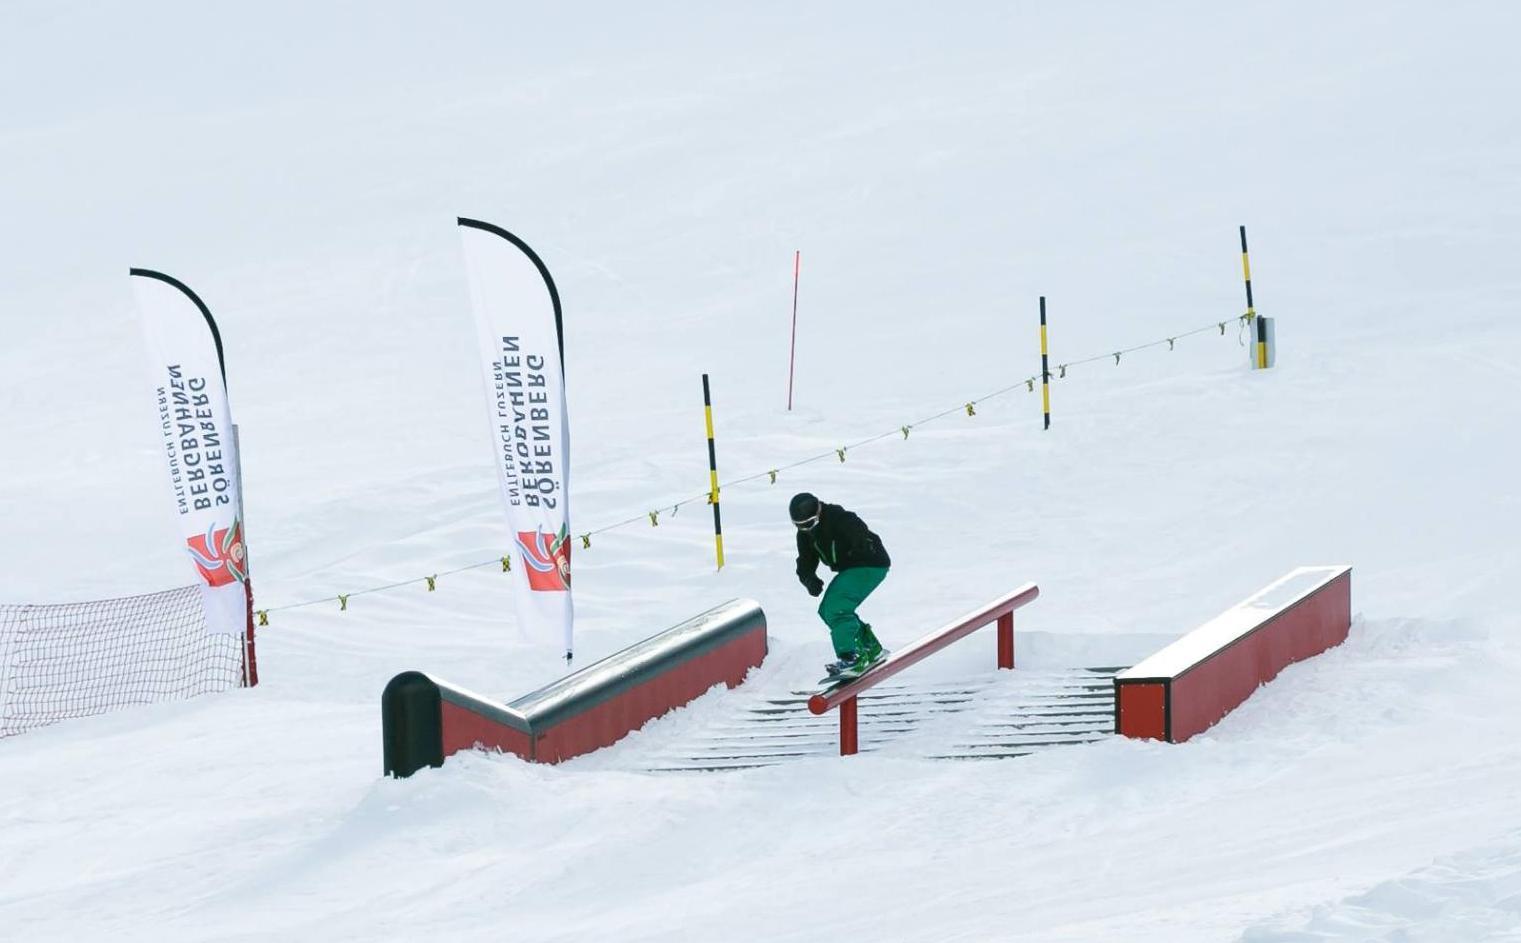 Freestyle-Line Sörenberg - Stairset